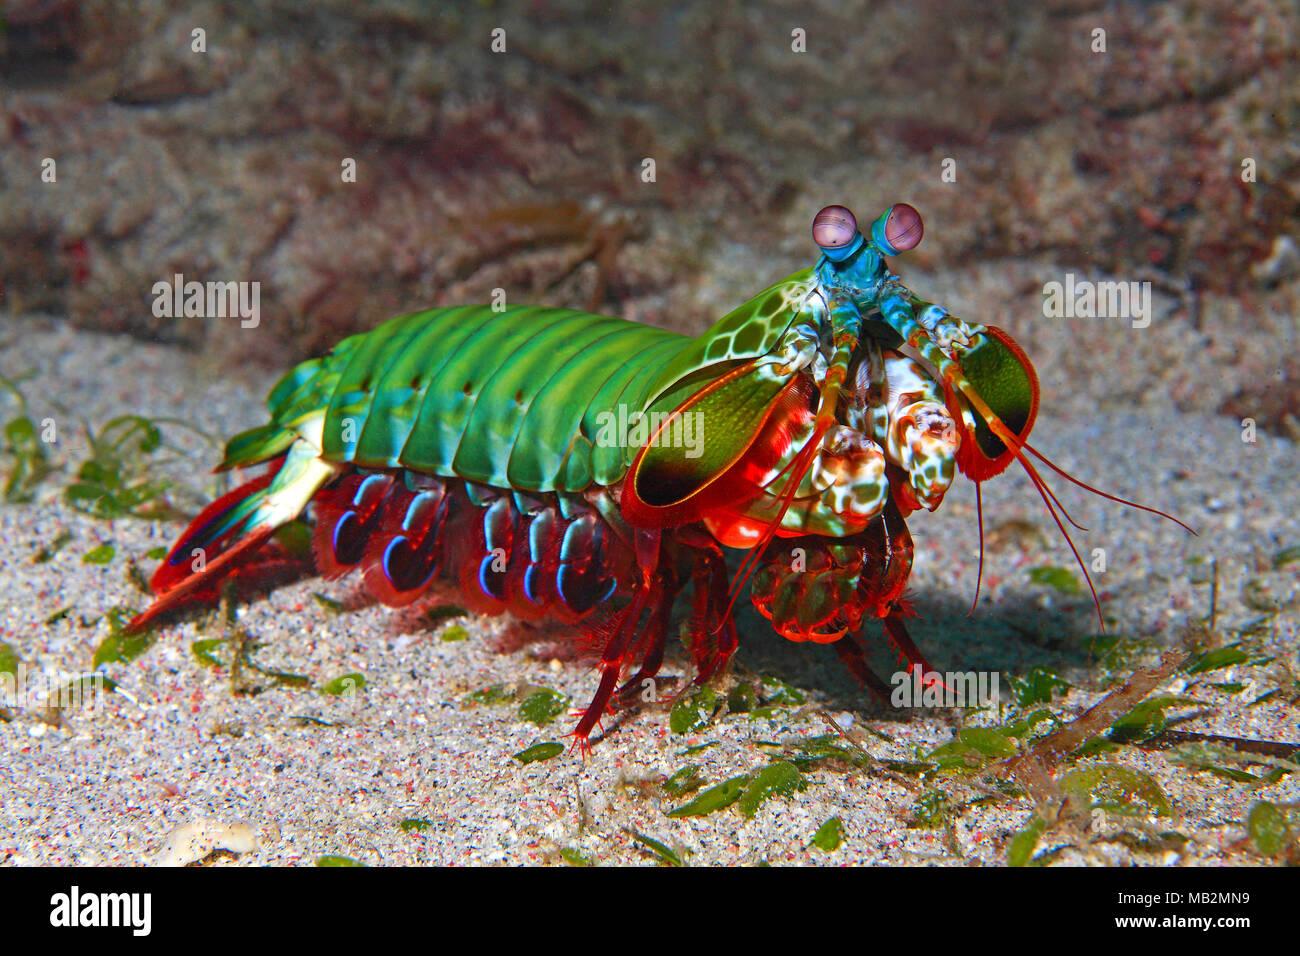 Clown mantis shrimp (Odontodactylus scyllarus), Sabang beach, Mindoro, Philippines, Asia - Stock Image